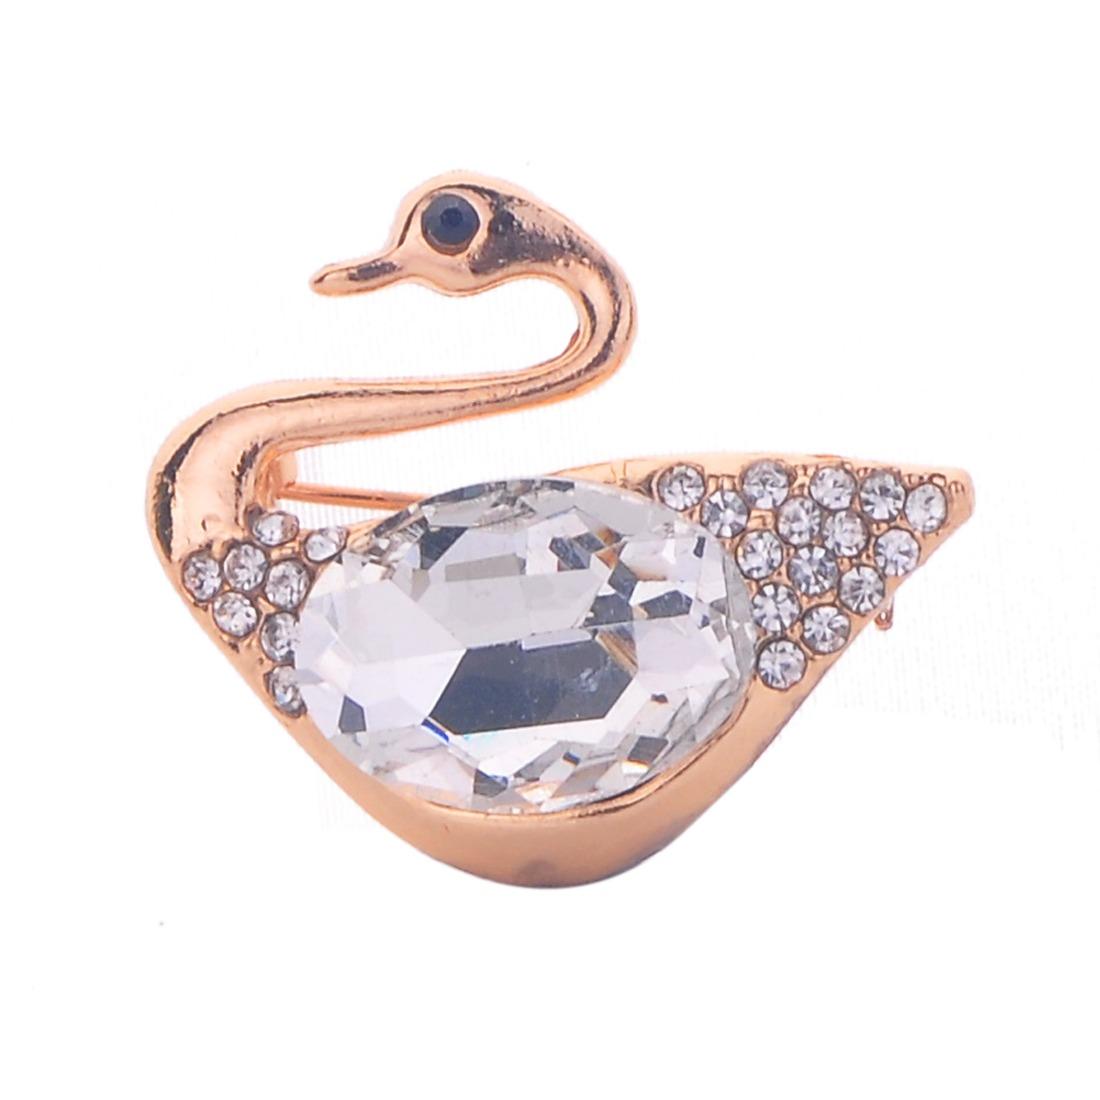 Brown Crystal rhinestone in Metal golden Mandarin Duck bridal wedding brooch pin